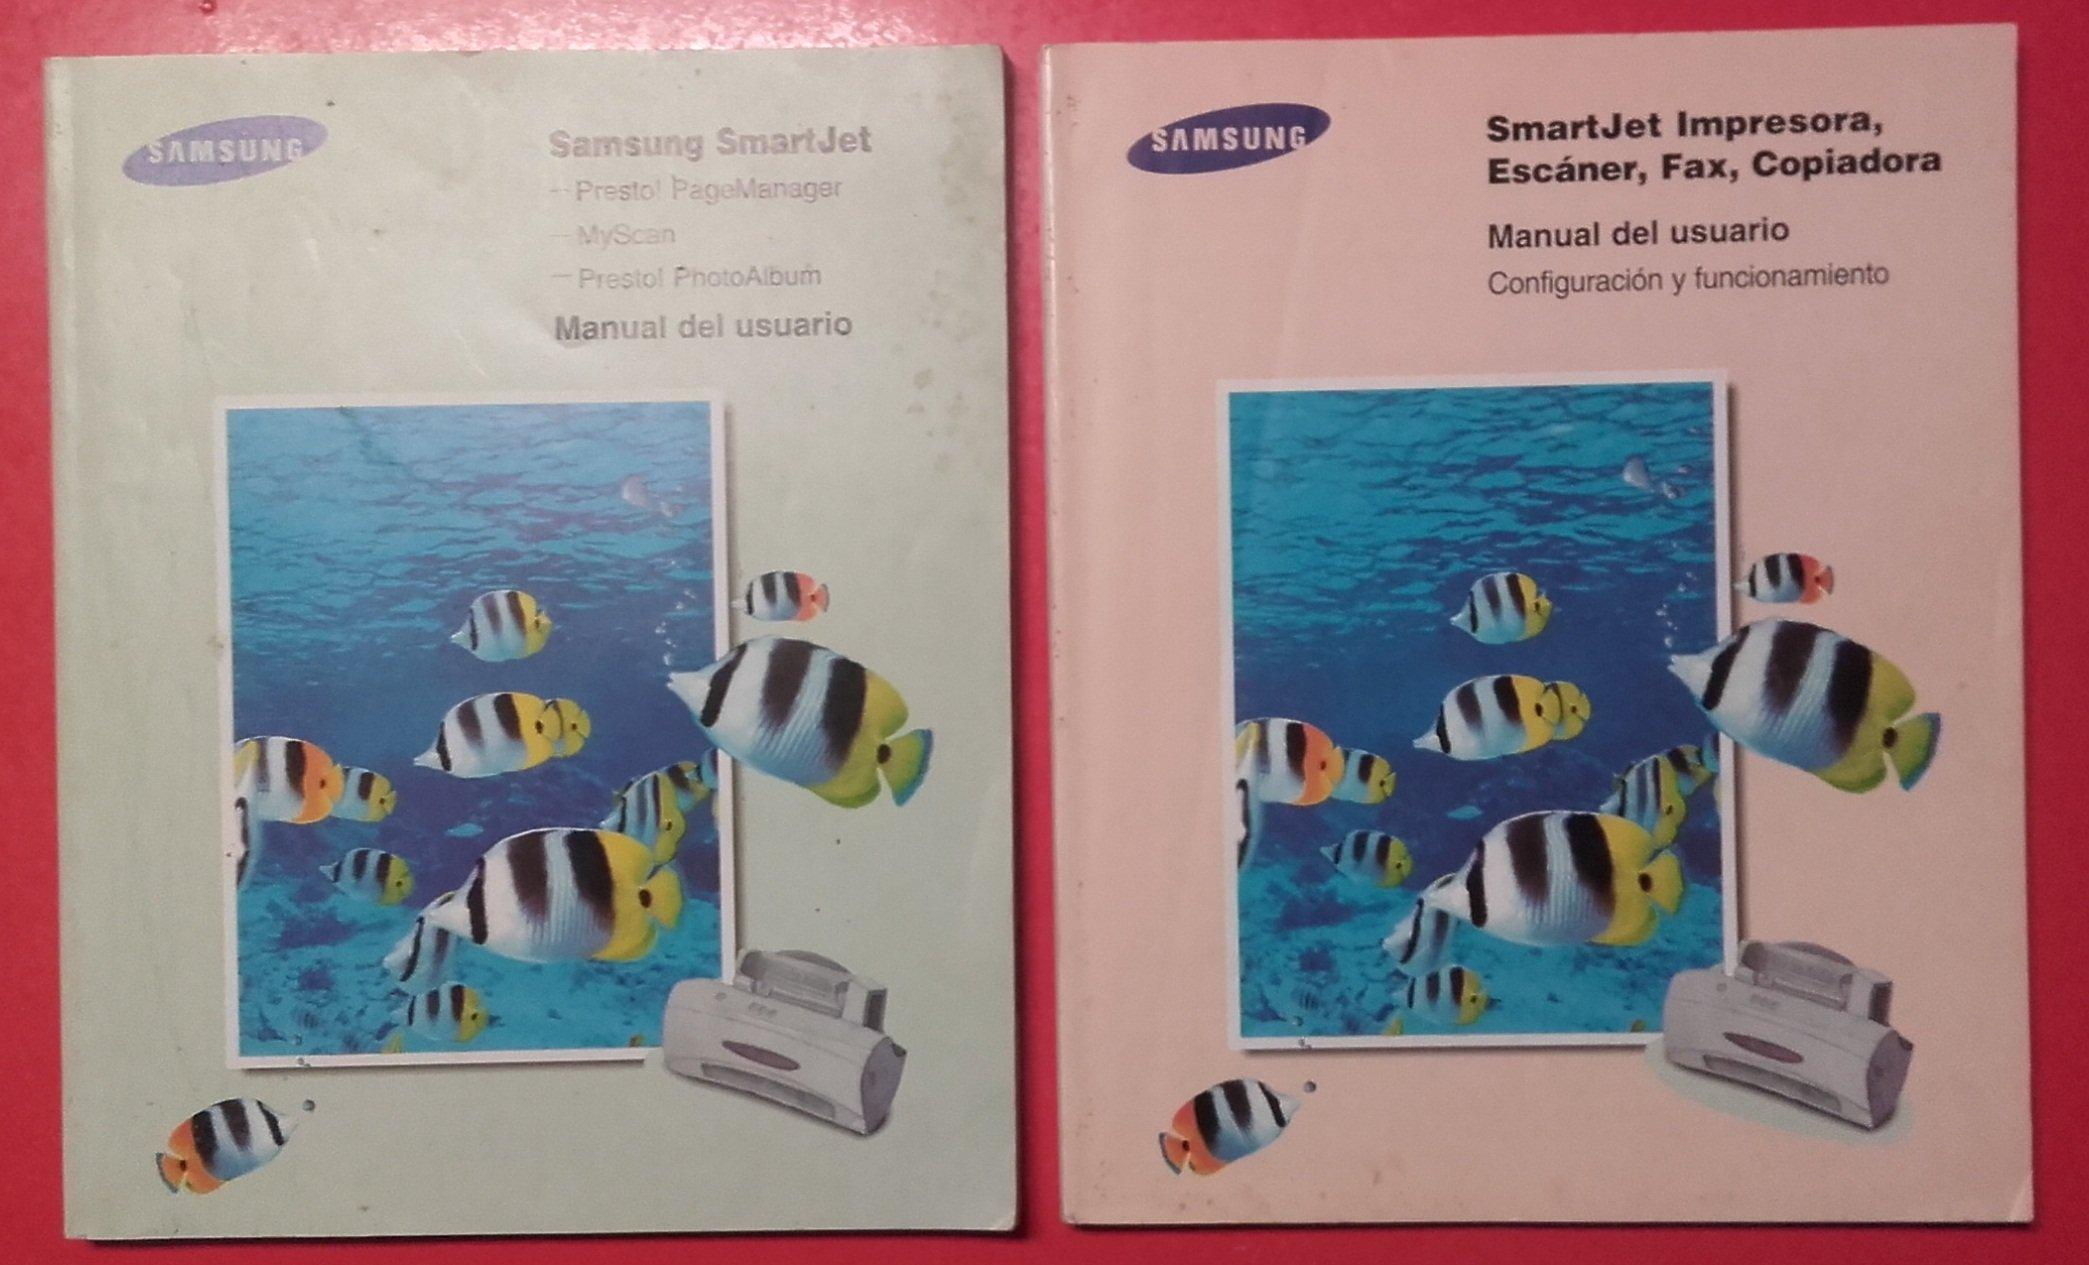 SmartJet Impresora, Escáner, Fax, Copiadora - Manual de ...